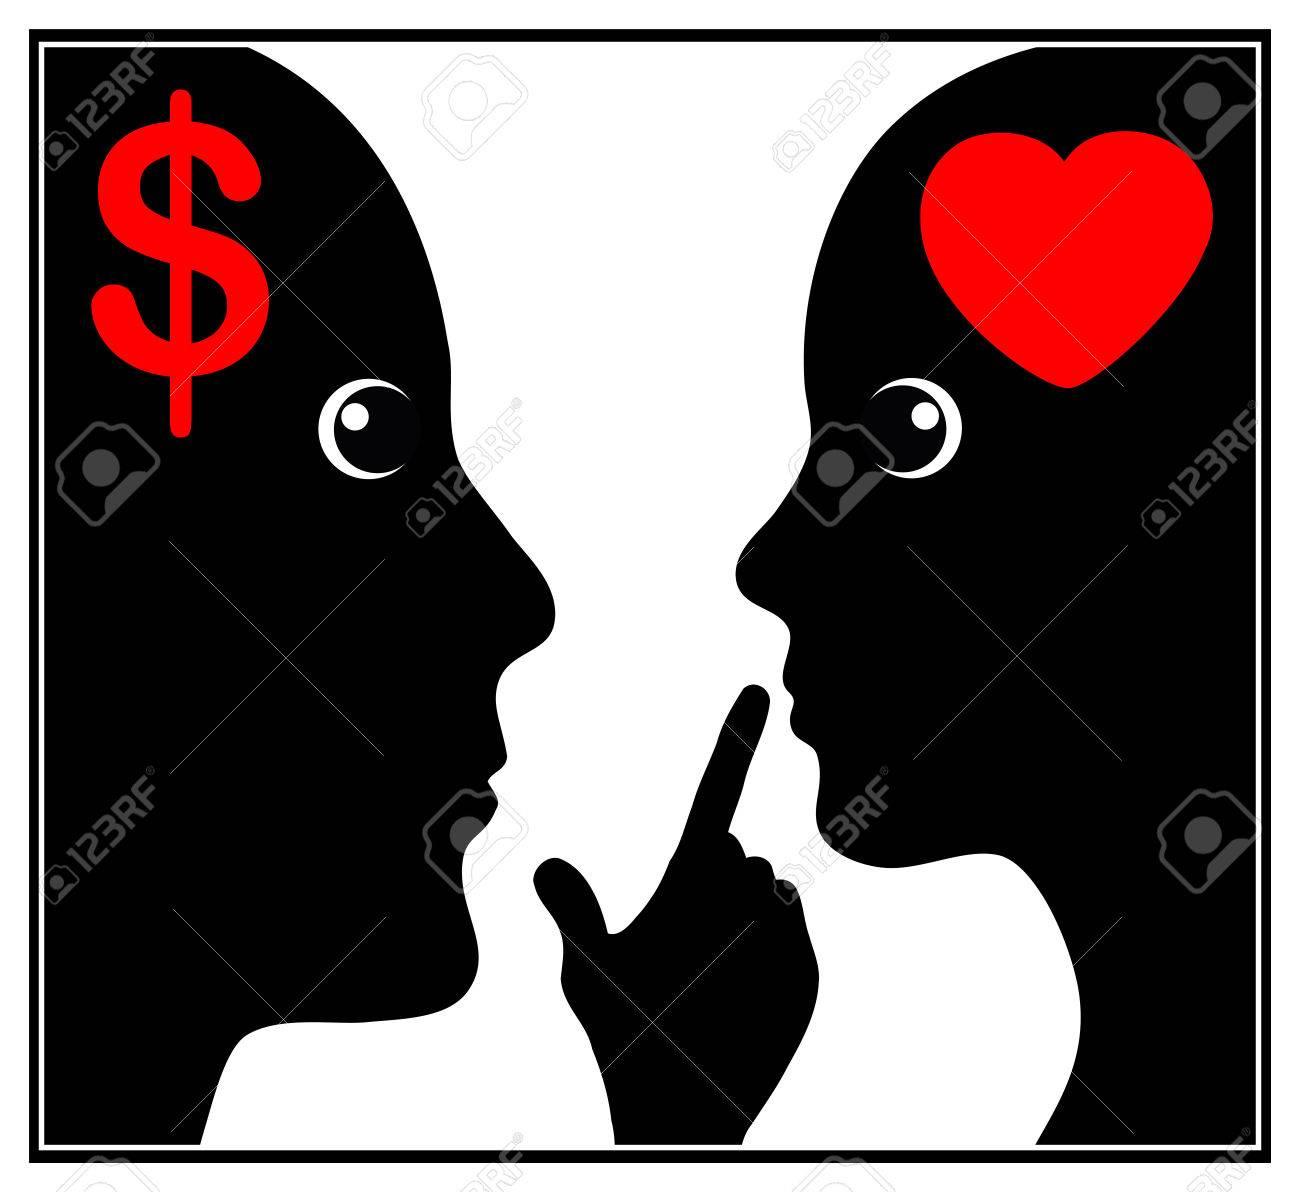 Secret Sex For Money Concept Sign Of A Tacit Agreement For Sex